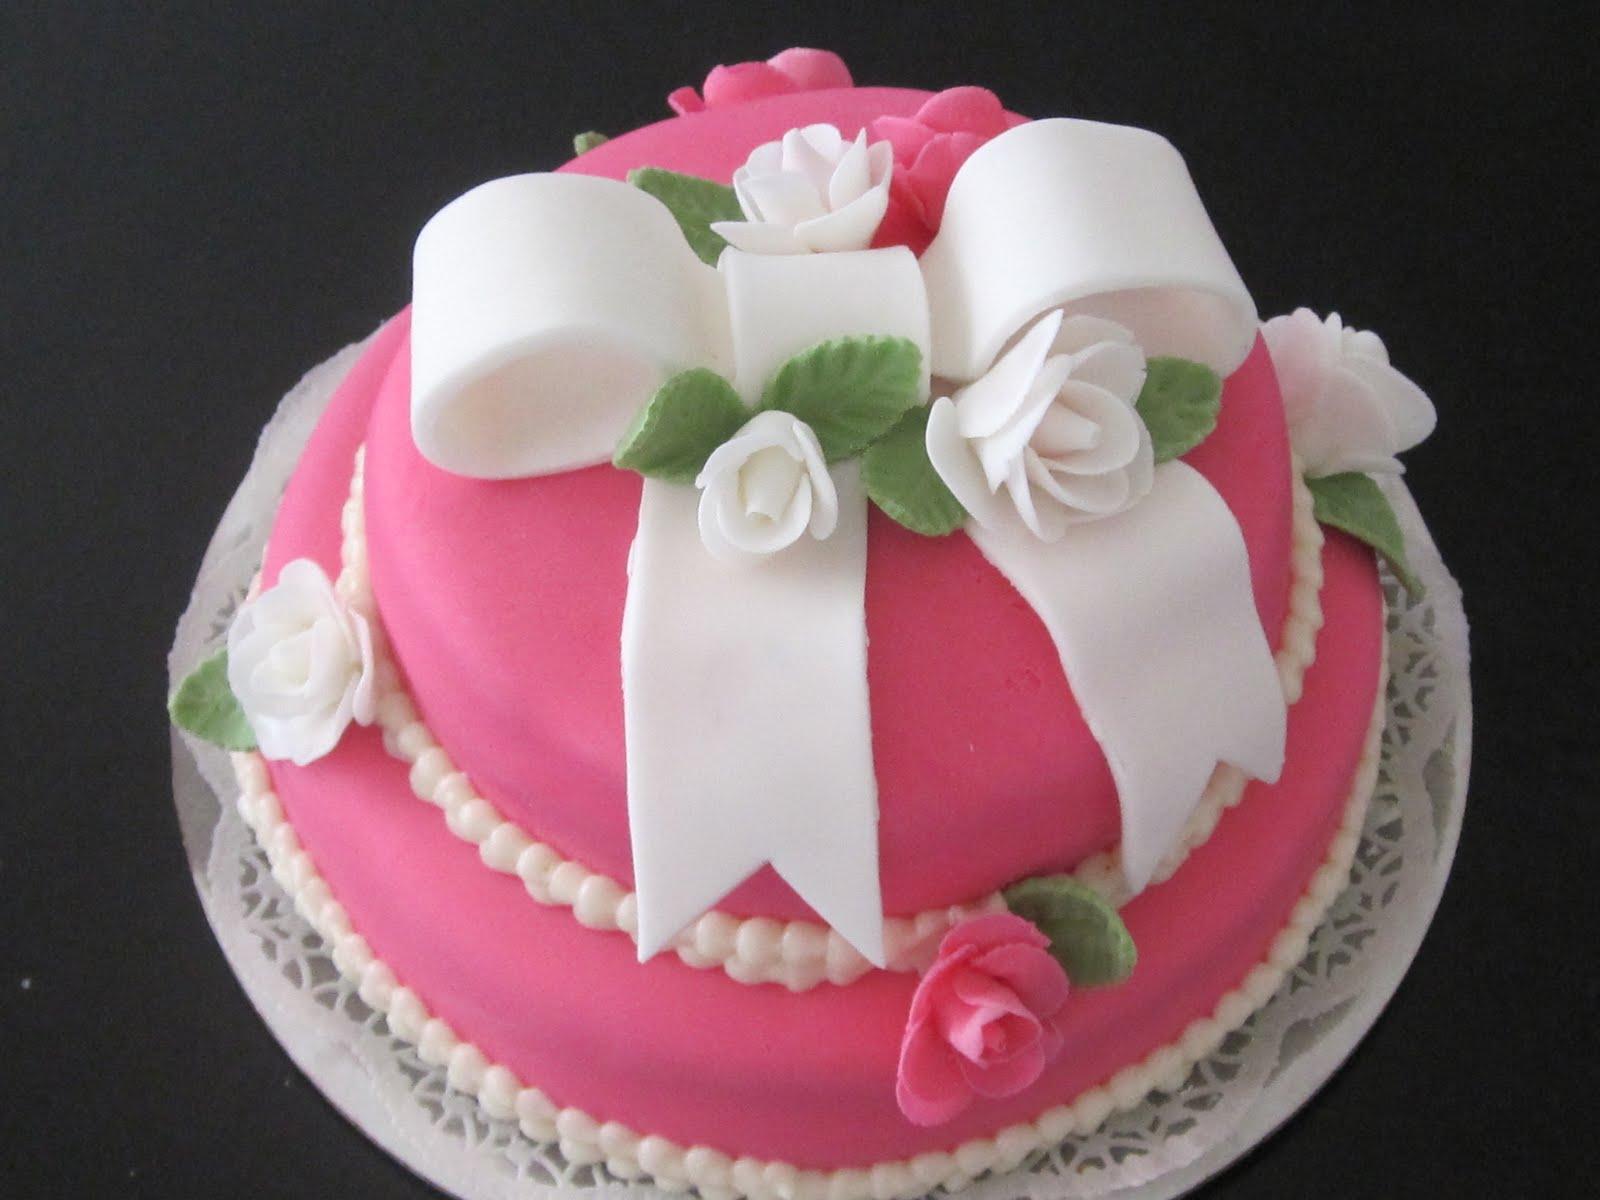 Birthday Cake For Girl Image Inspiration of Cake and Birthday